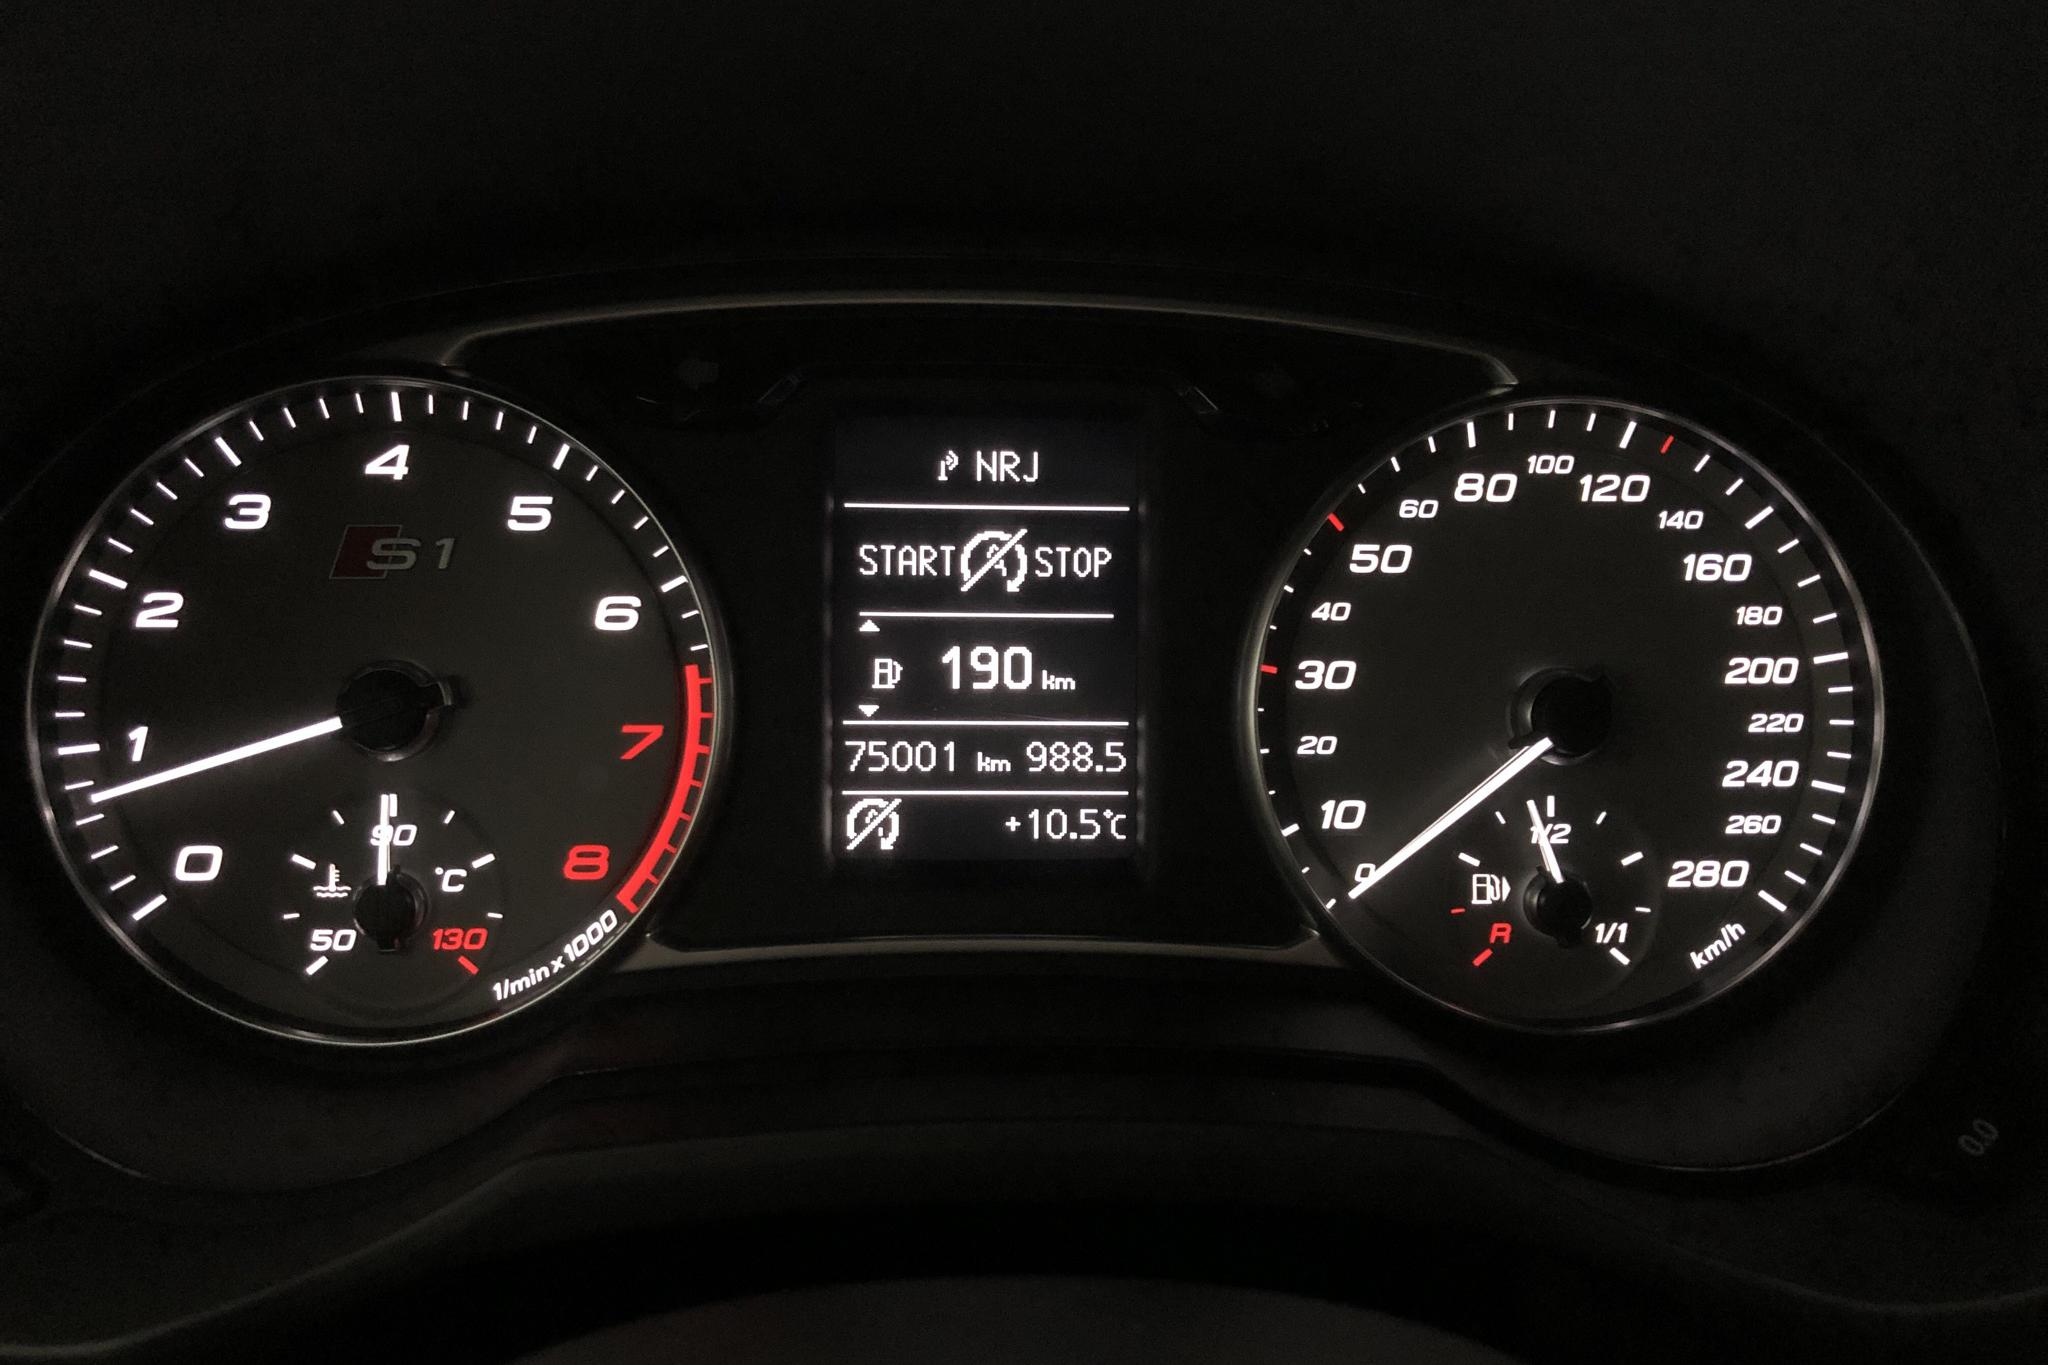 Audi S1 Sportback 2.0 TFSI quattro (231hk) - 7 499 mil - Manuell - blå - 2016